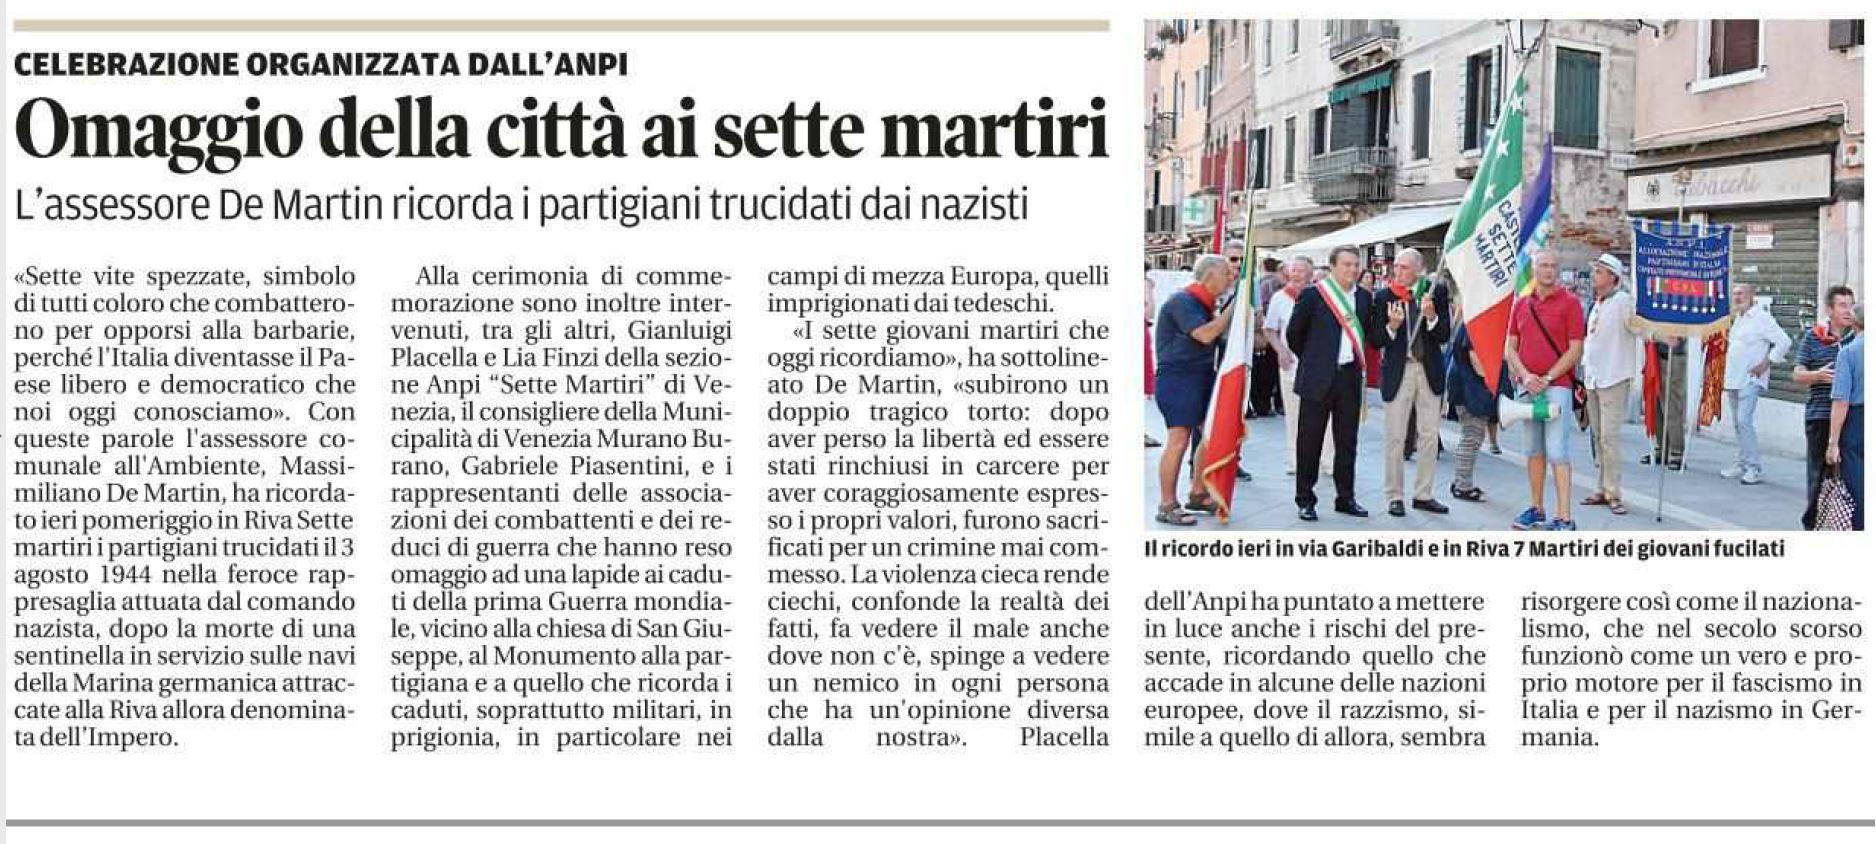 La Nuova Venezia 4 agosto 2016